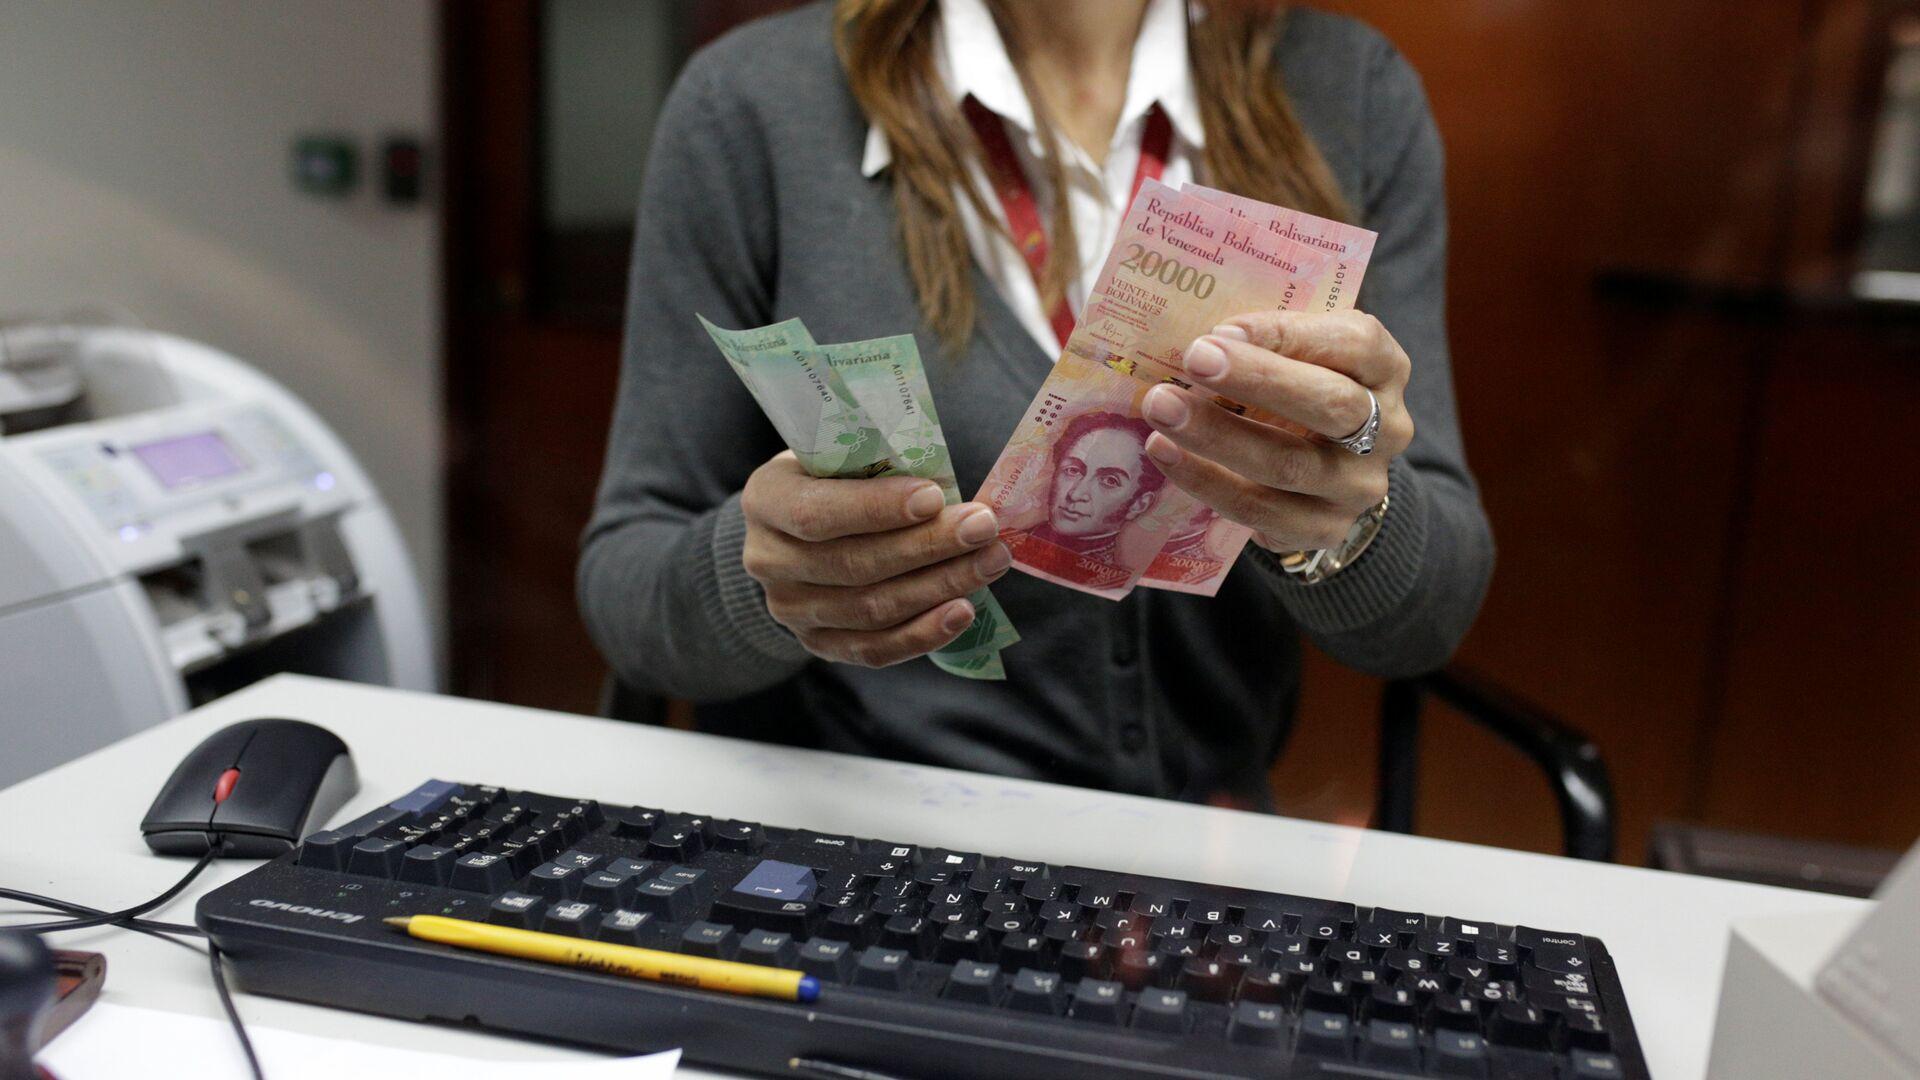 A bank teller counts bolivar banknotes at a Banco de Venezuela branch in Caracas - Sputnik Mundo, 1920, 27.09.2021